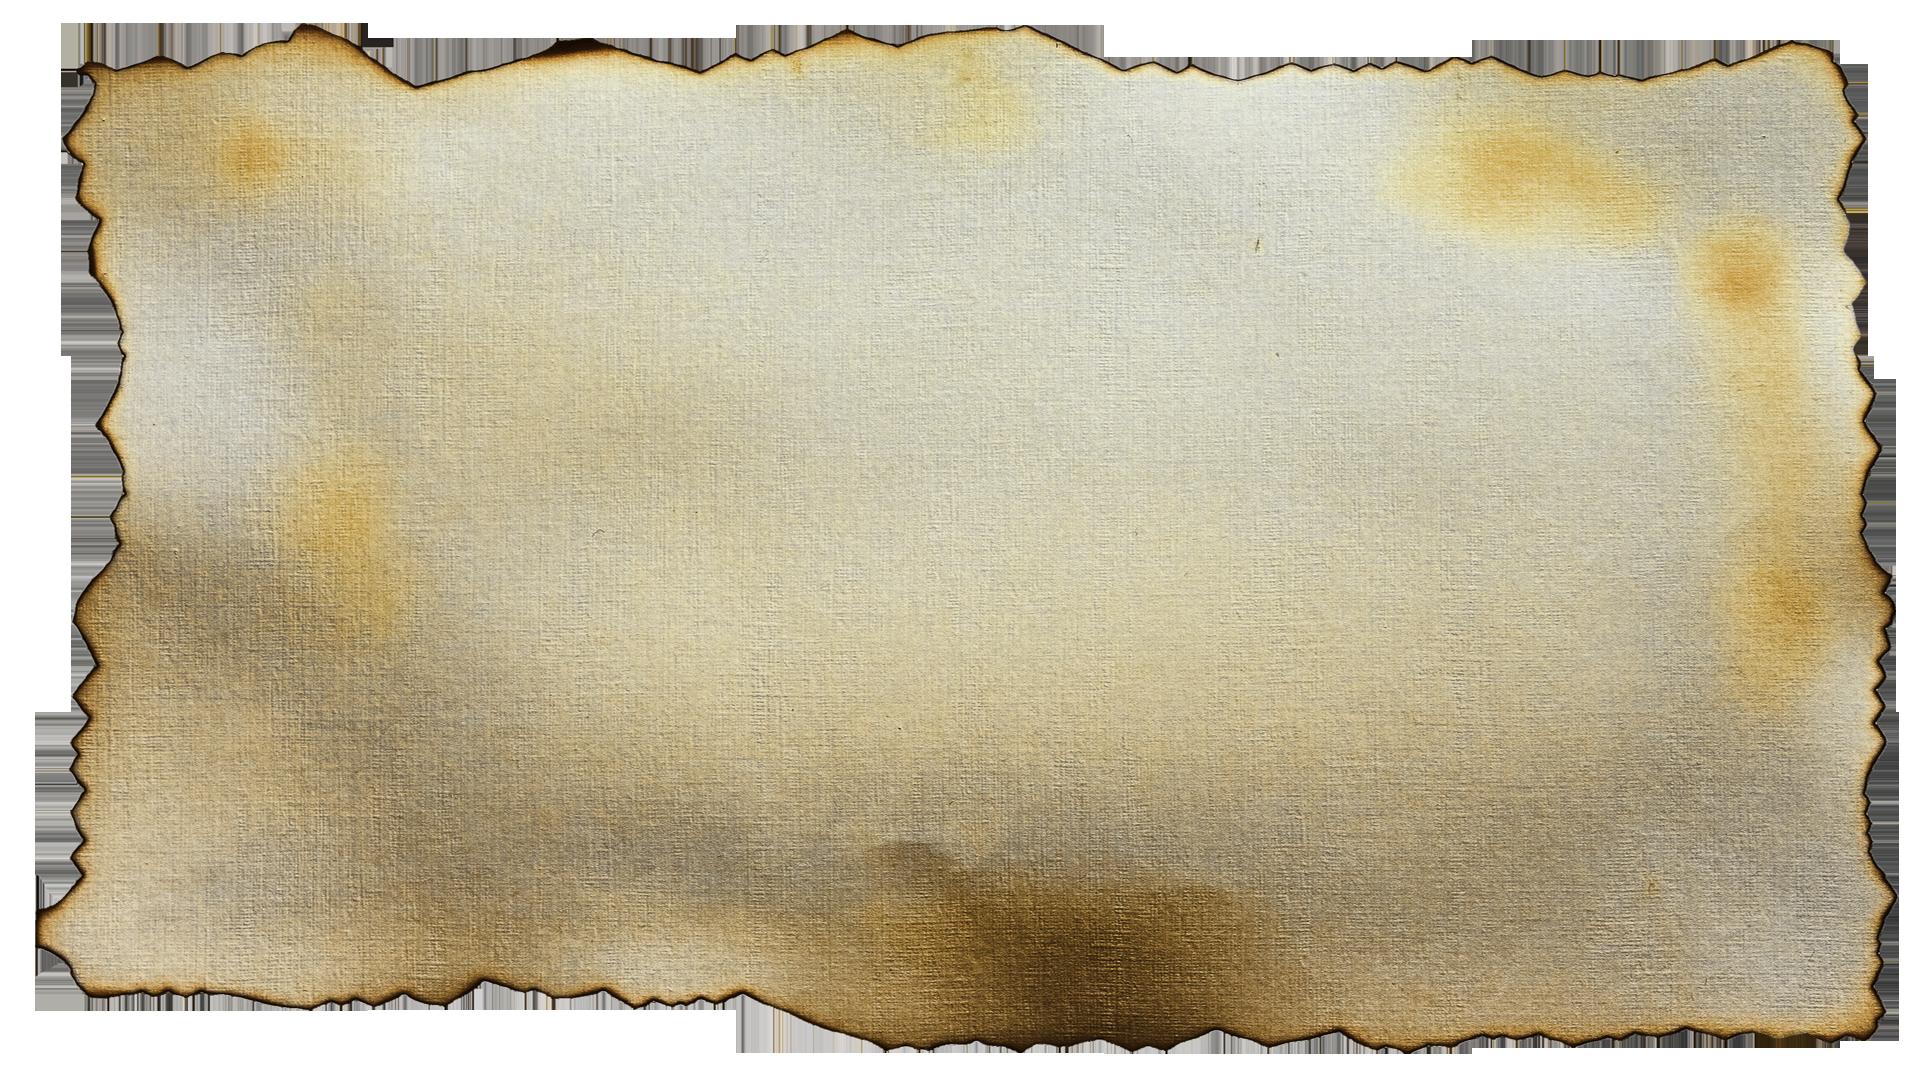 Vintage Burned Paper Background Texture Hd - Burnt Paper, Transparent background PNG HD thumbnail